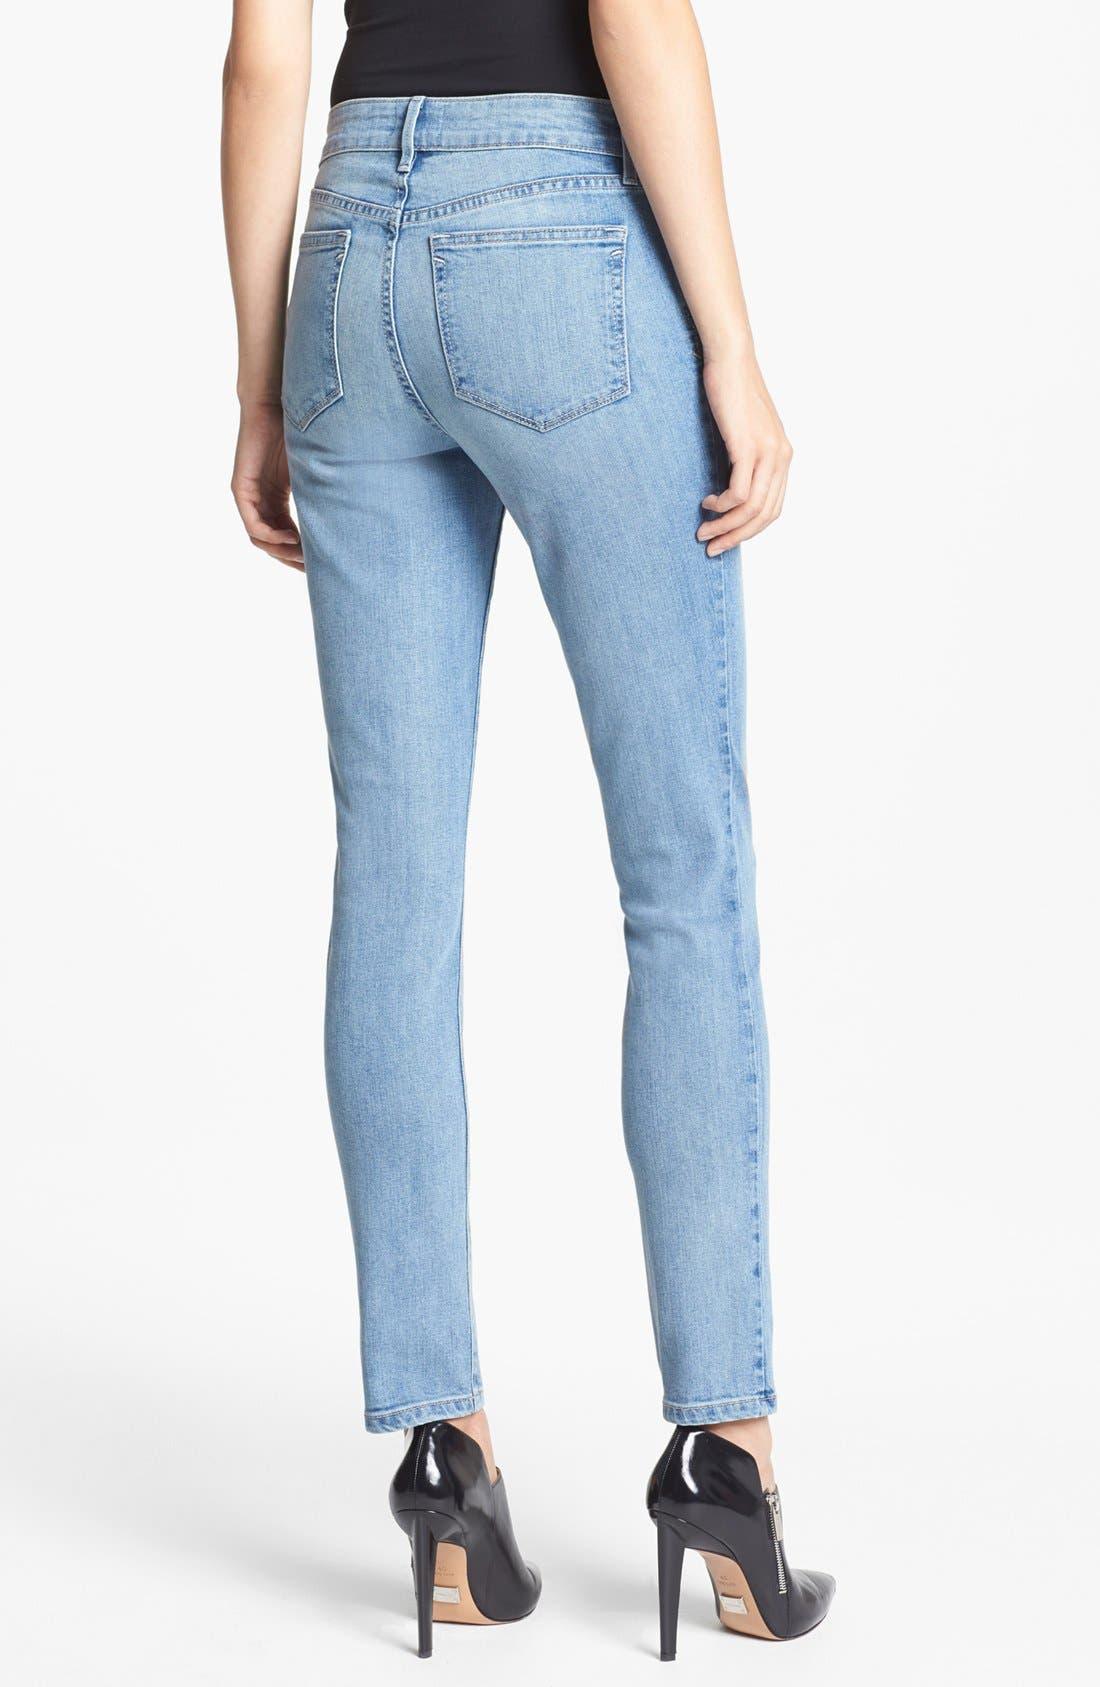 Alternate Image 3  - NYDJ 'Alina' Stretch Skinny Jeans (Sacramento) (Petite)